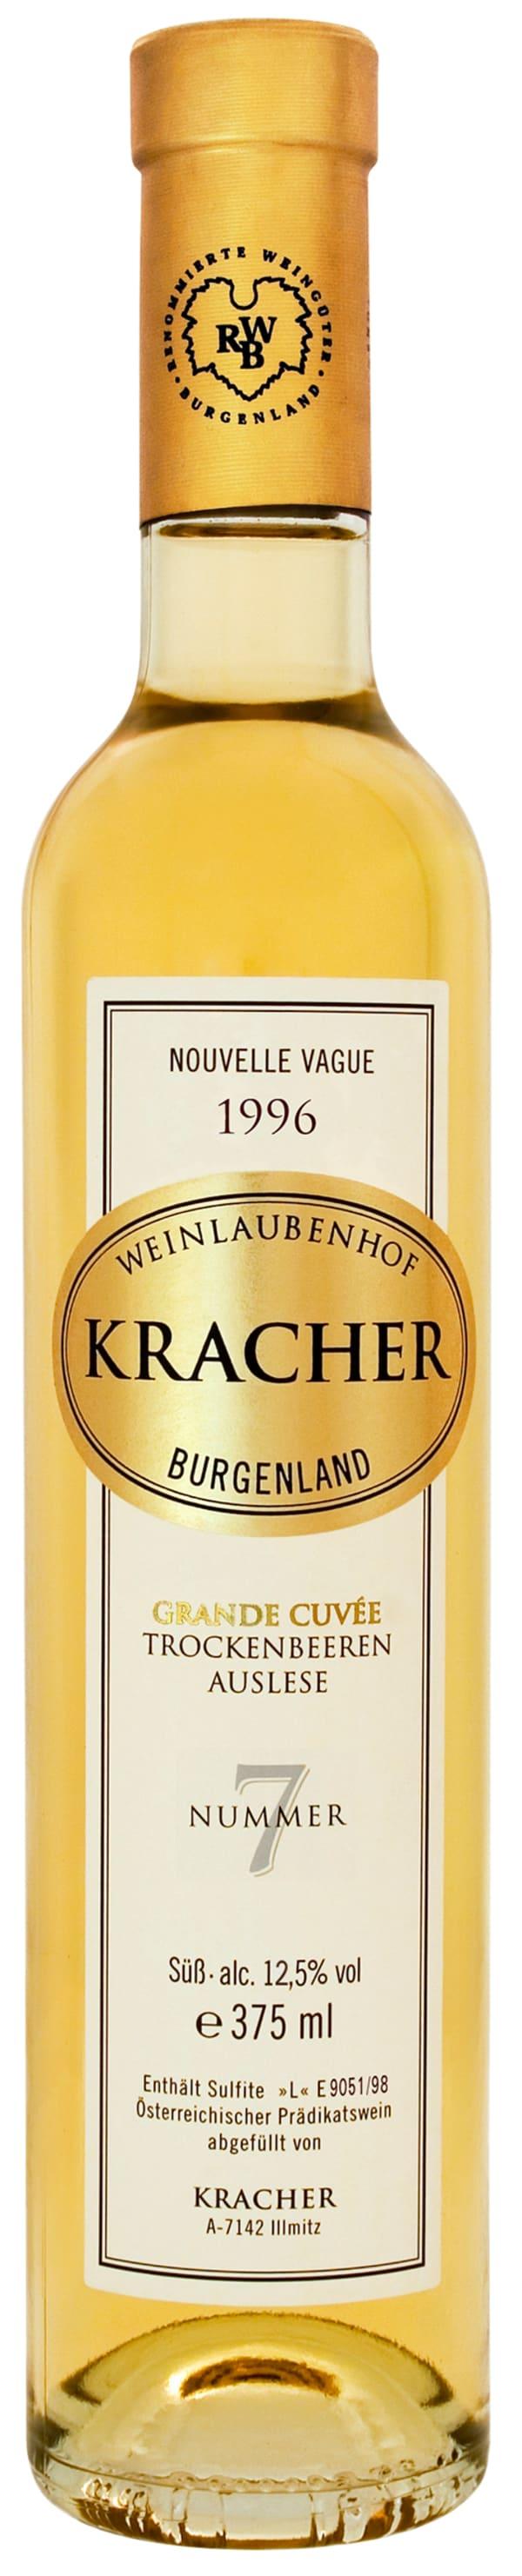 Kracher Grande Cuvée Trockenbeerenauslese Nummer 7 1996